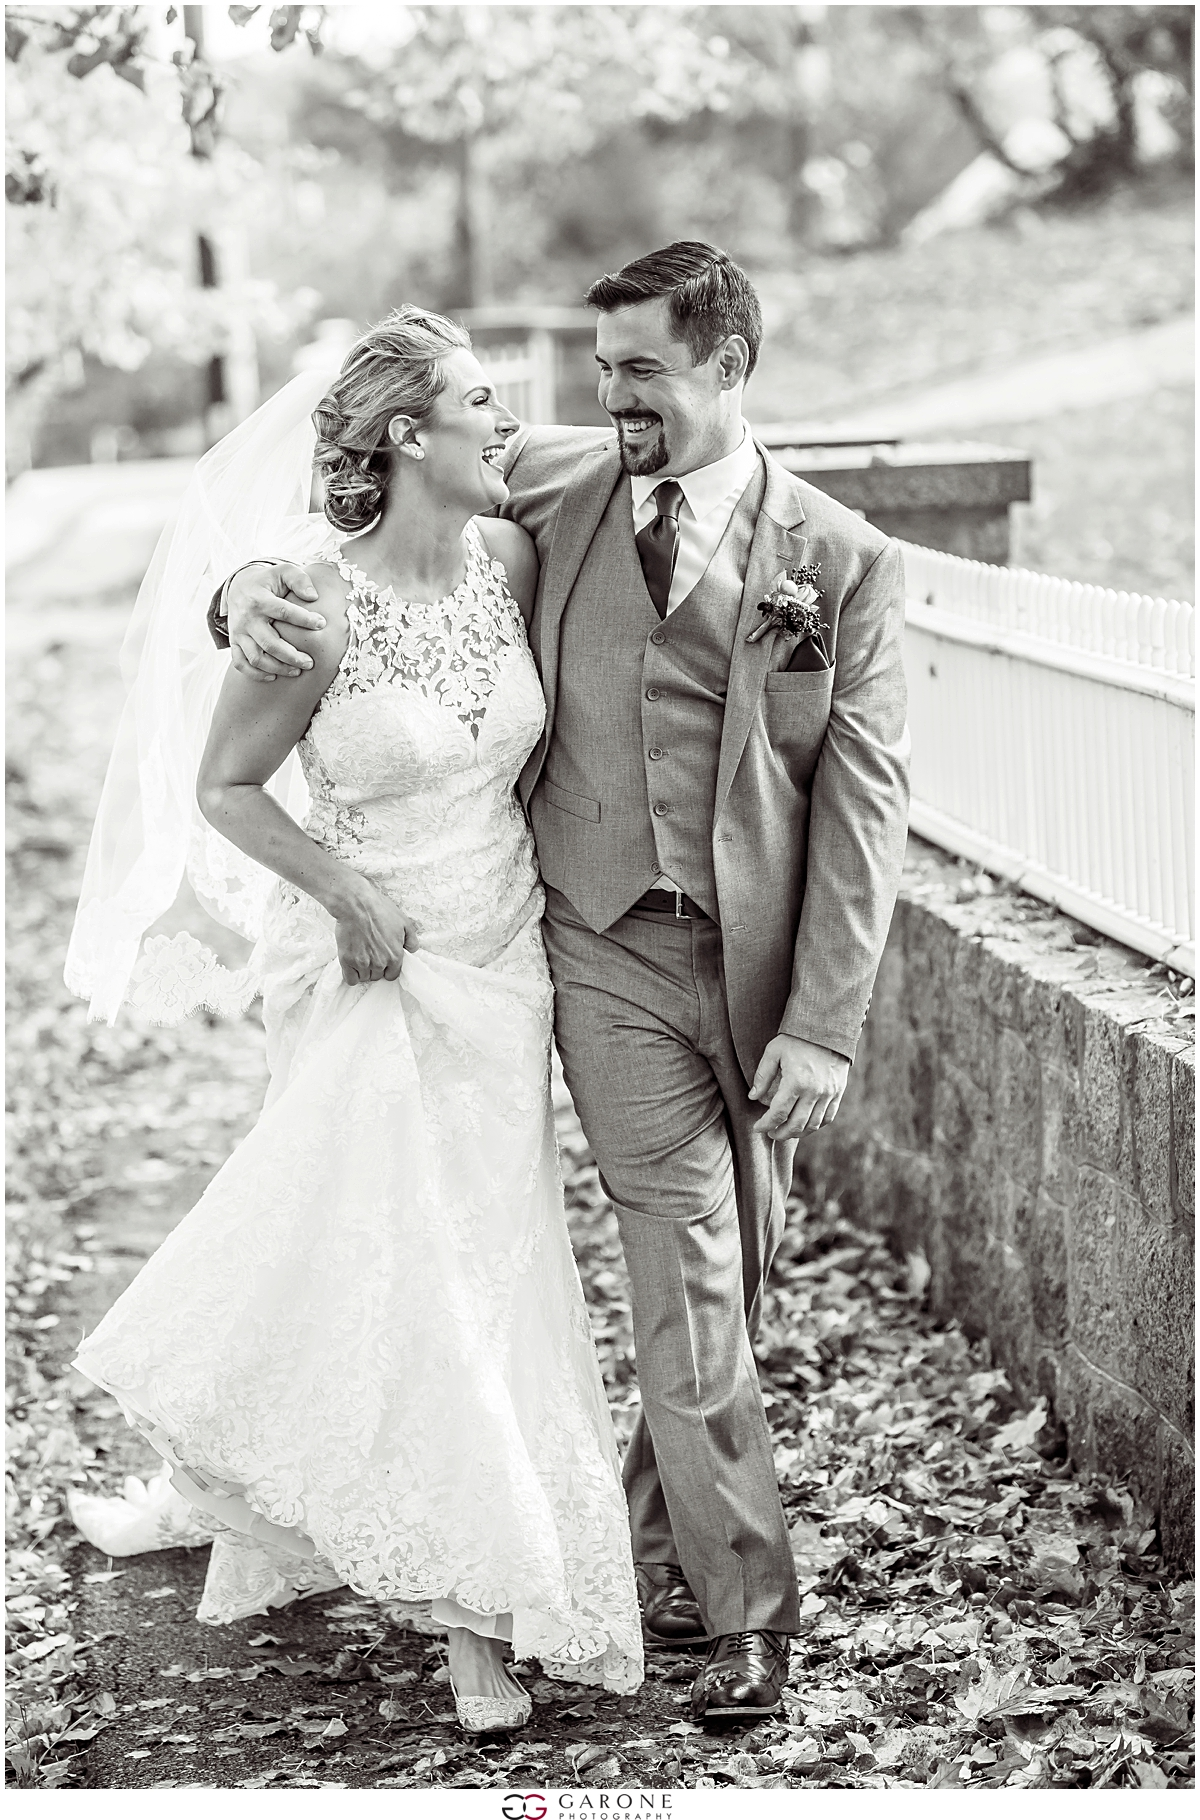 Kate_Chris_Atlantica_Cohasset_Massachusettes_Boston_Wedding_Photography_Garone_Photography_0022.jpg